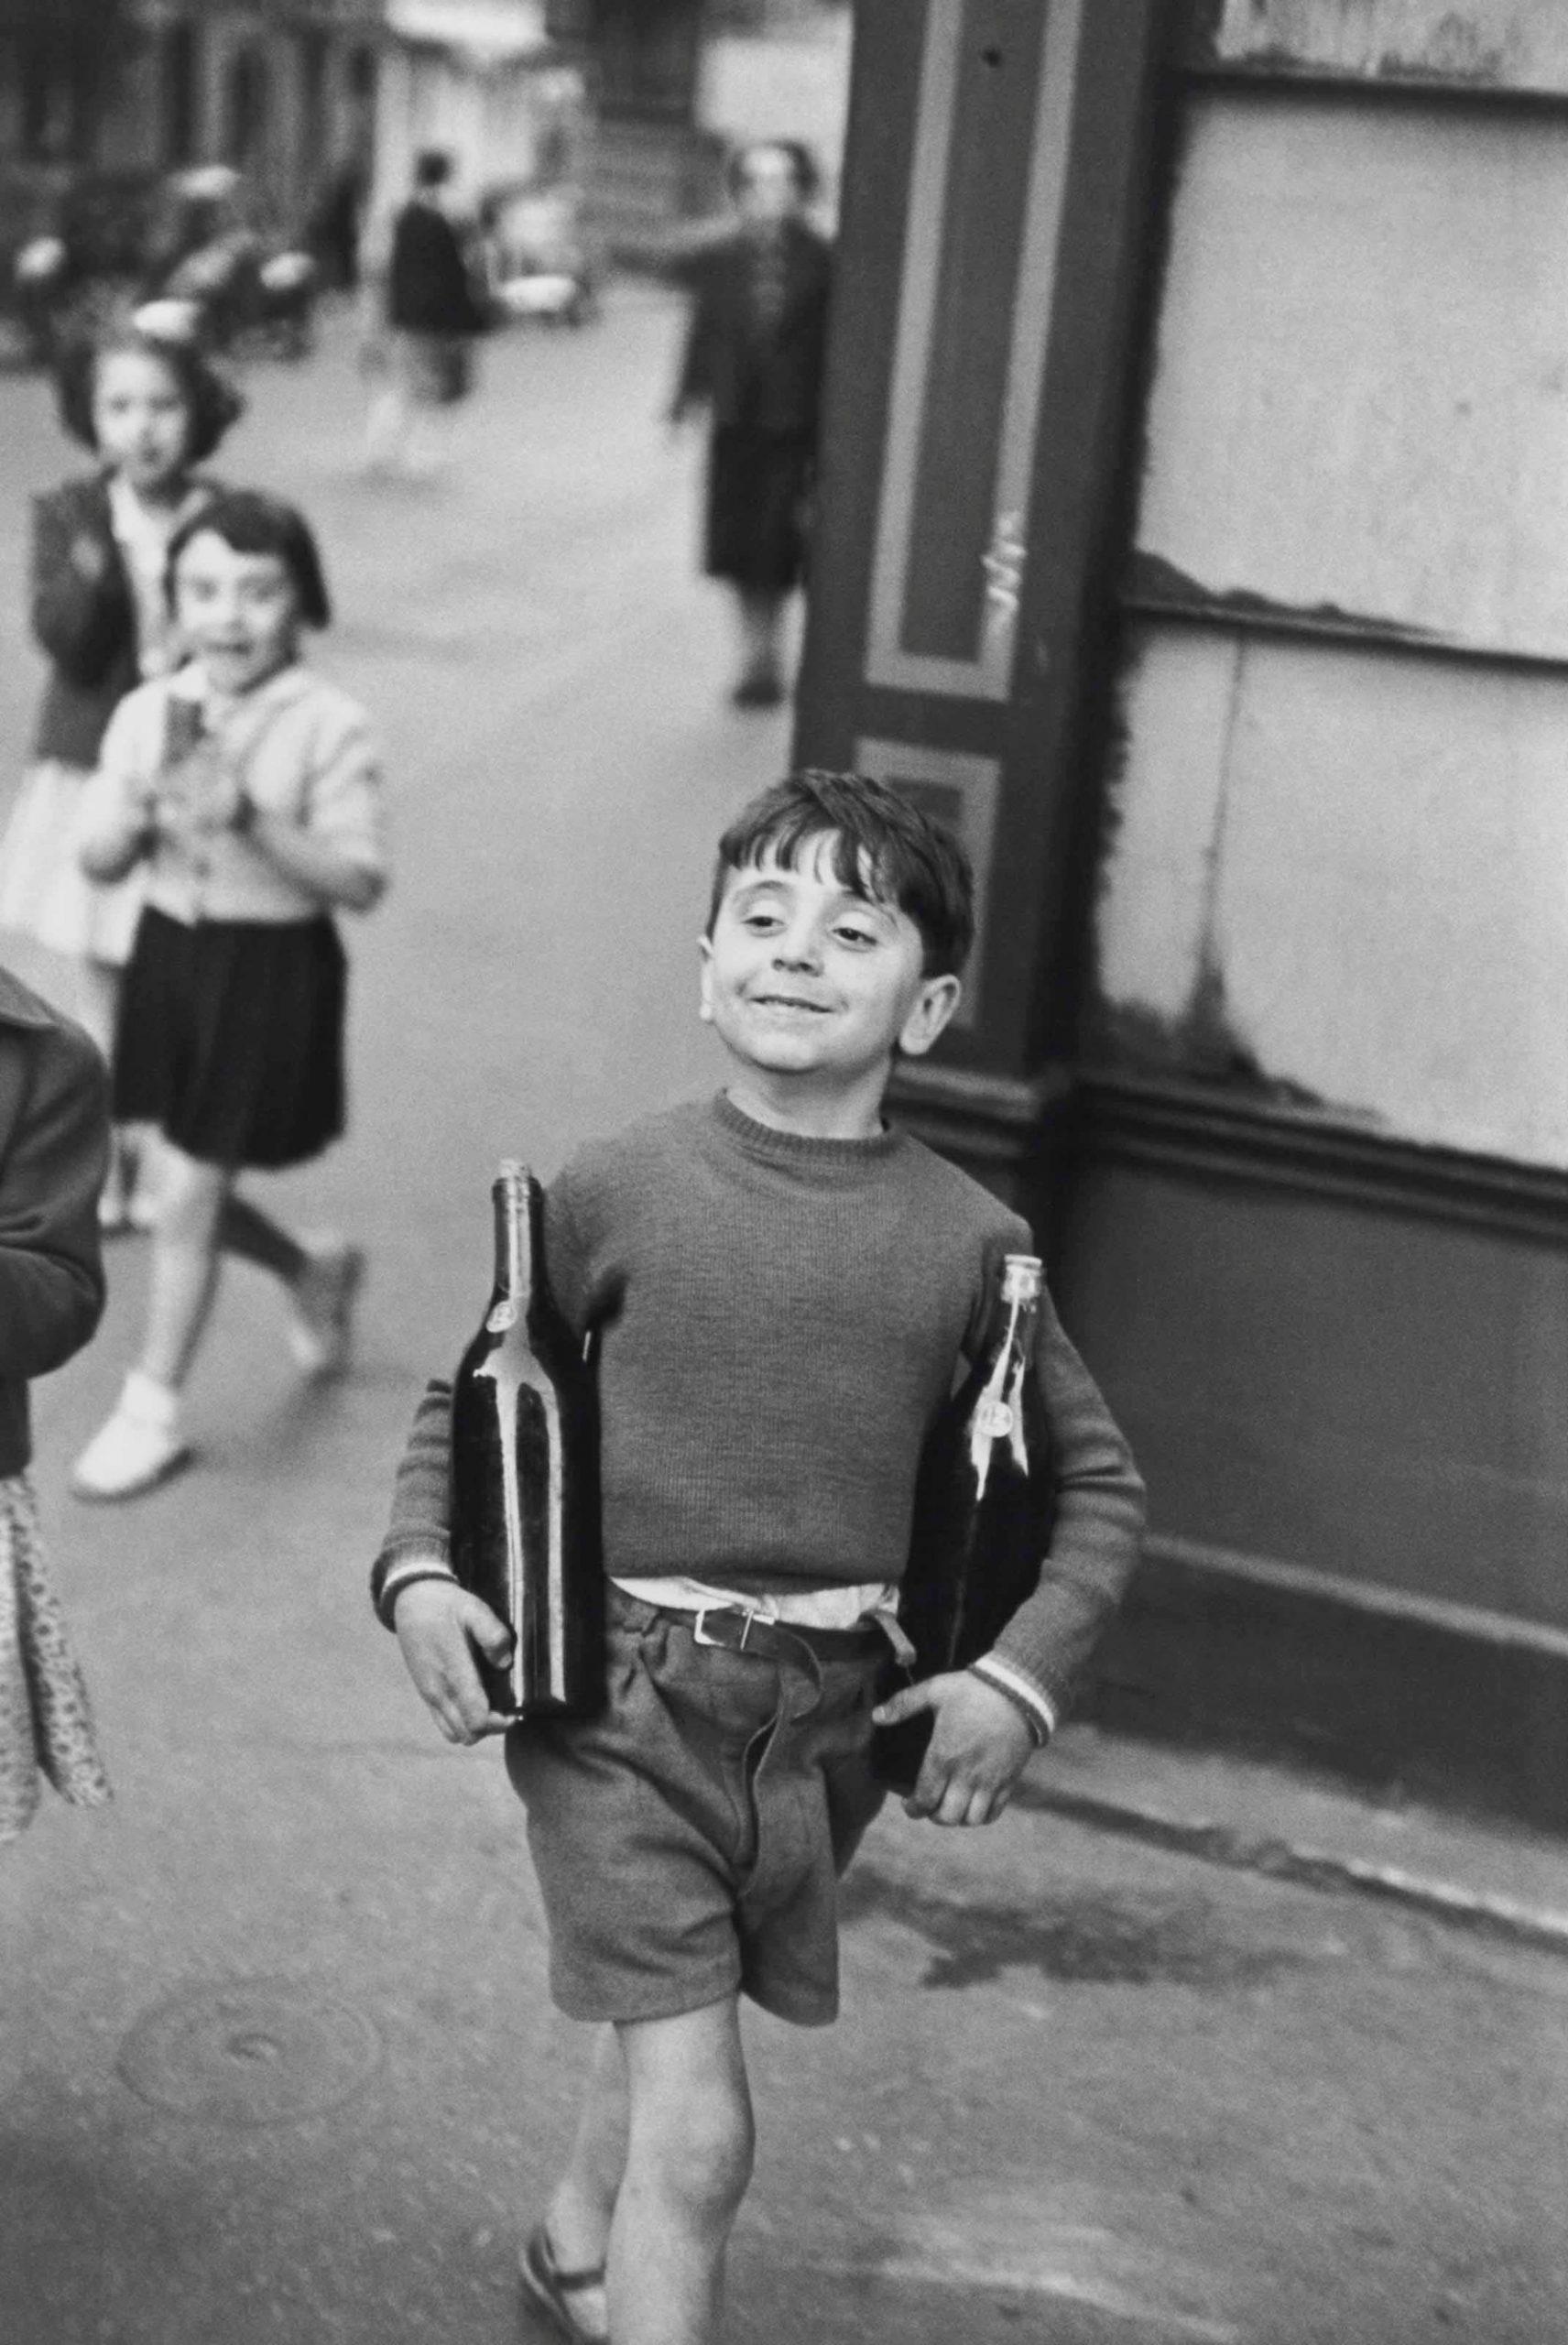 A boy carrying wine bottles, Henri Cartier-Bresson photos